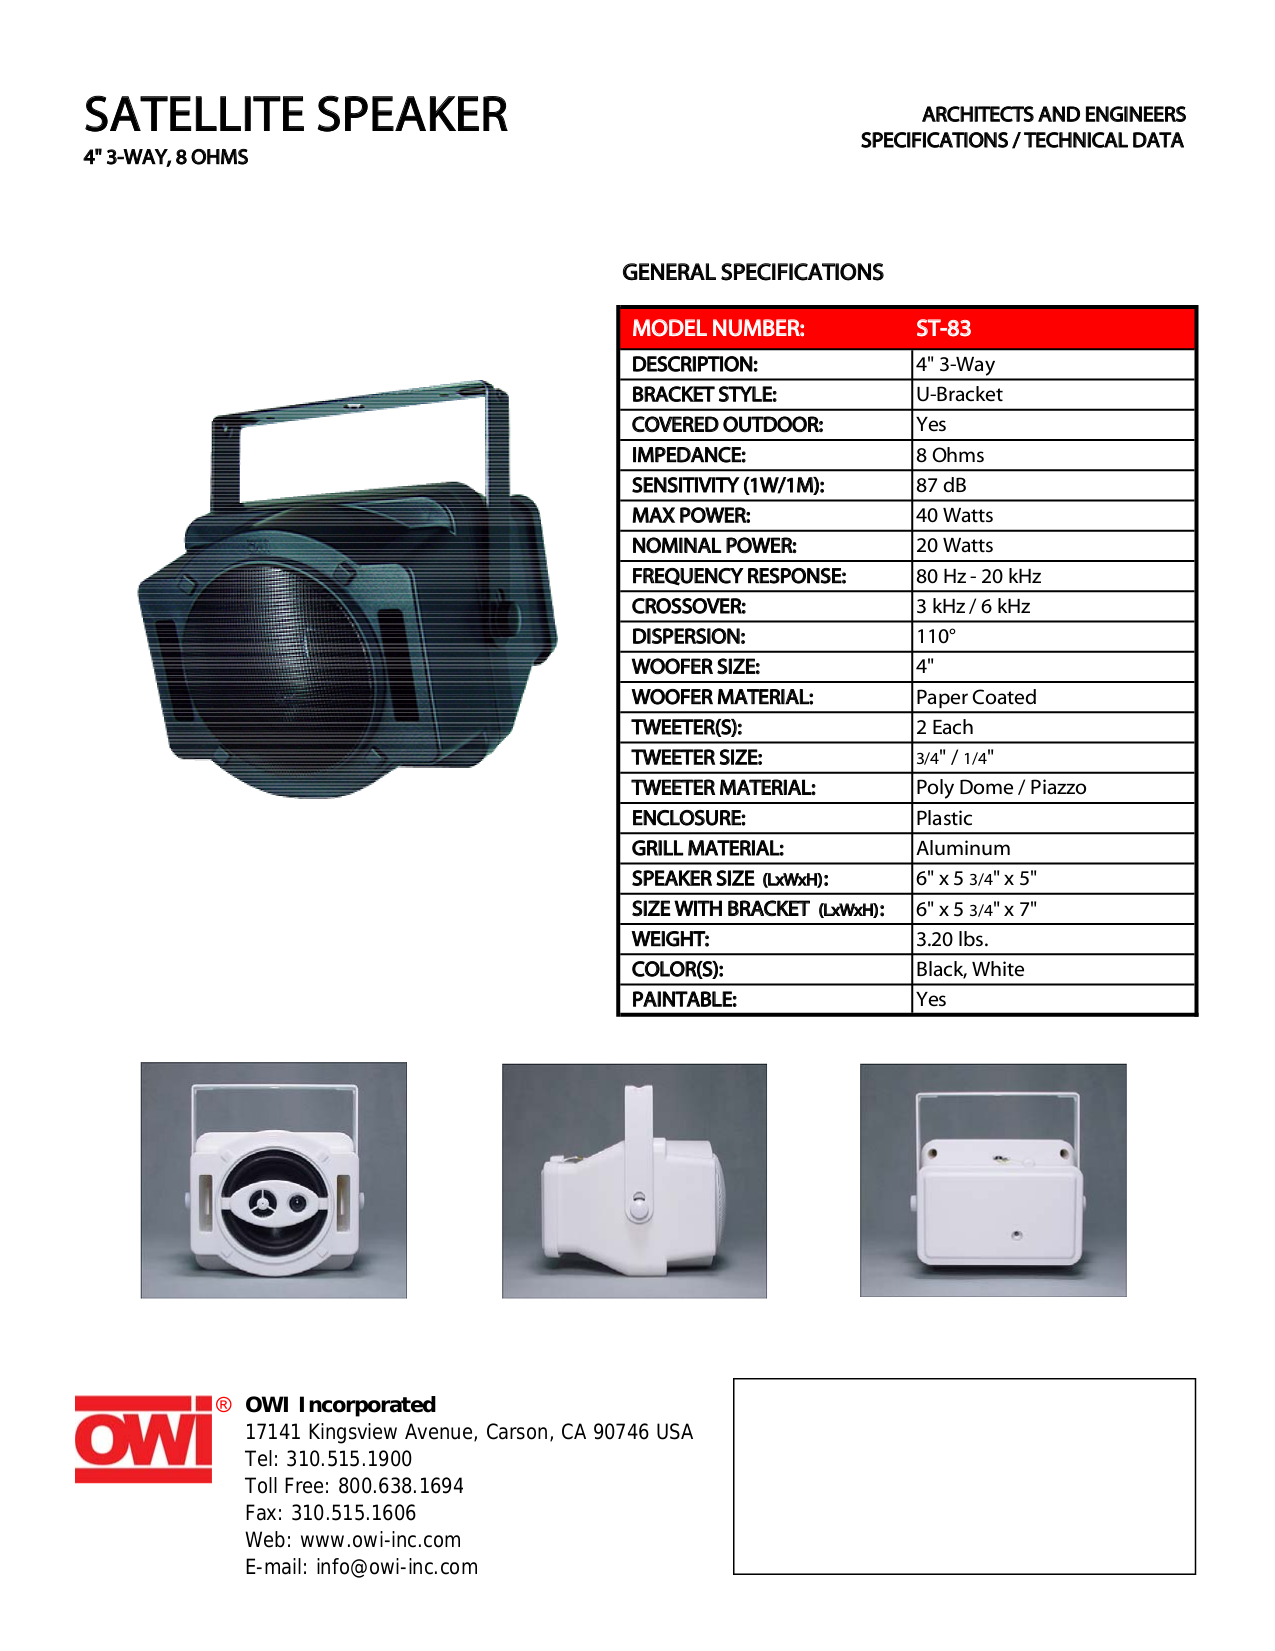 pdf for Owi Speaker ST83 manual